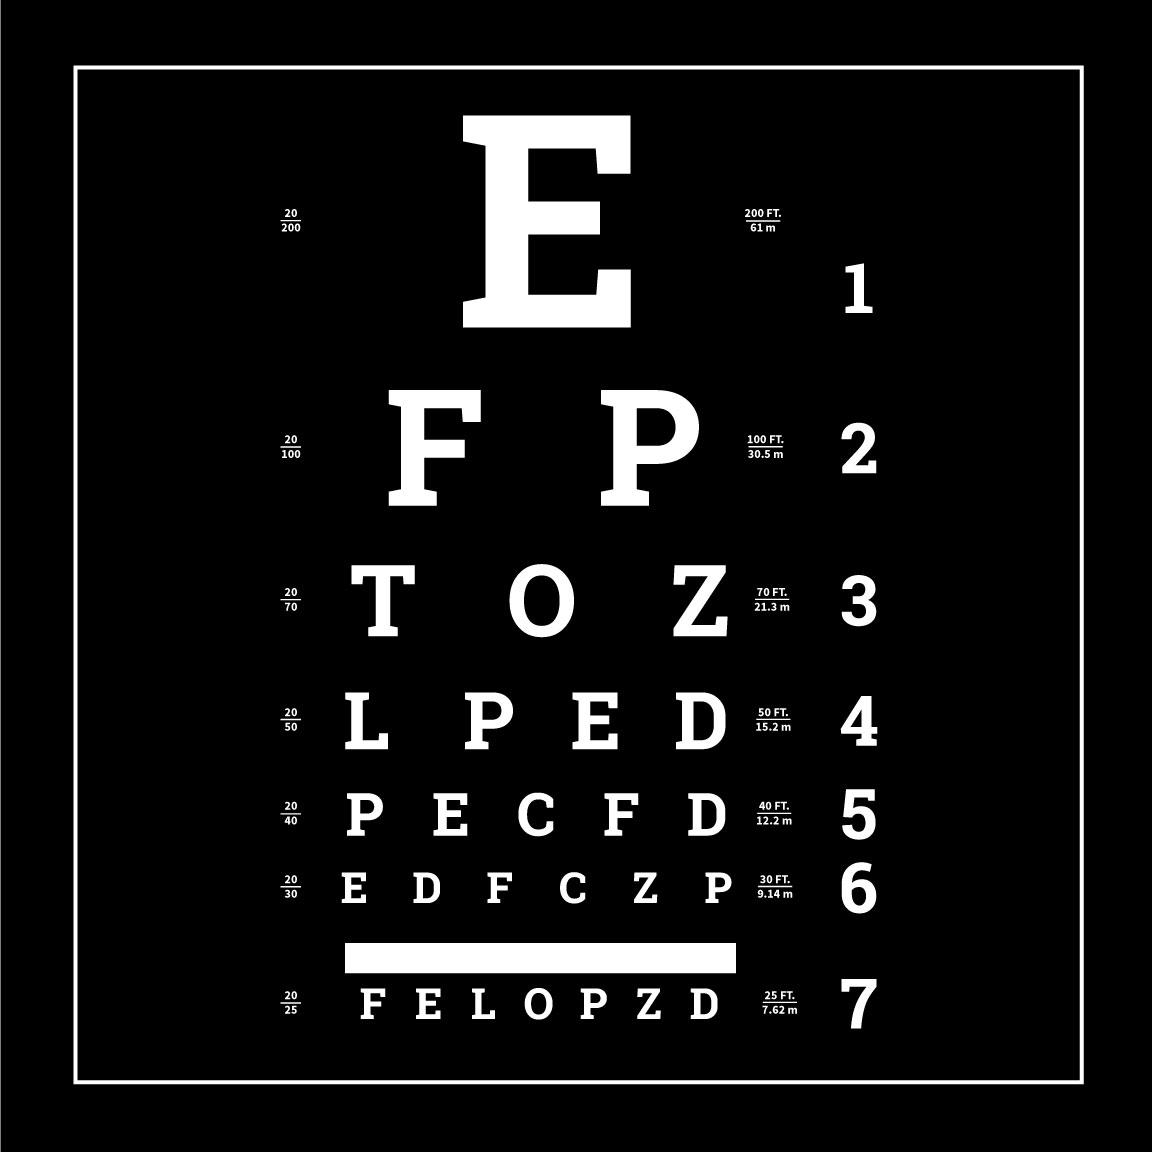 Free eye exam at any Value Optical location